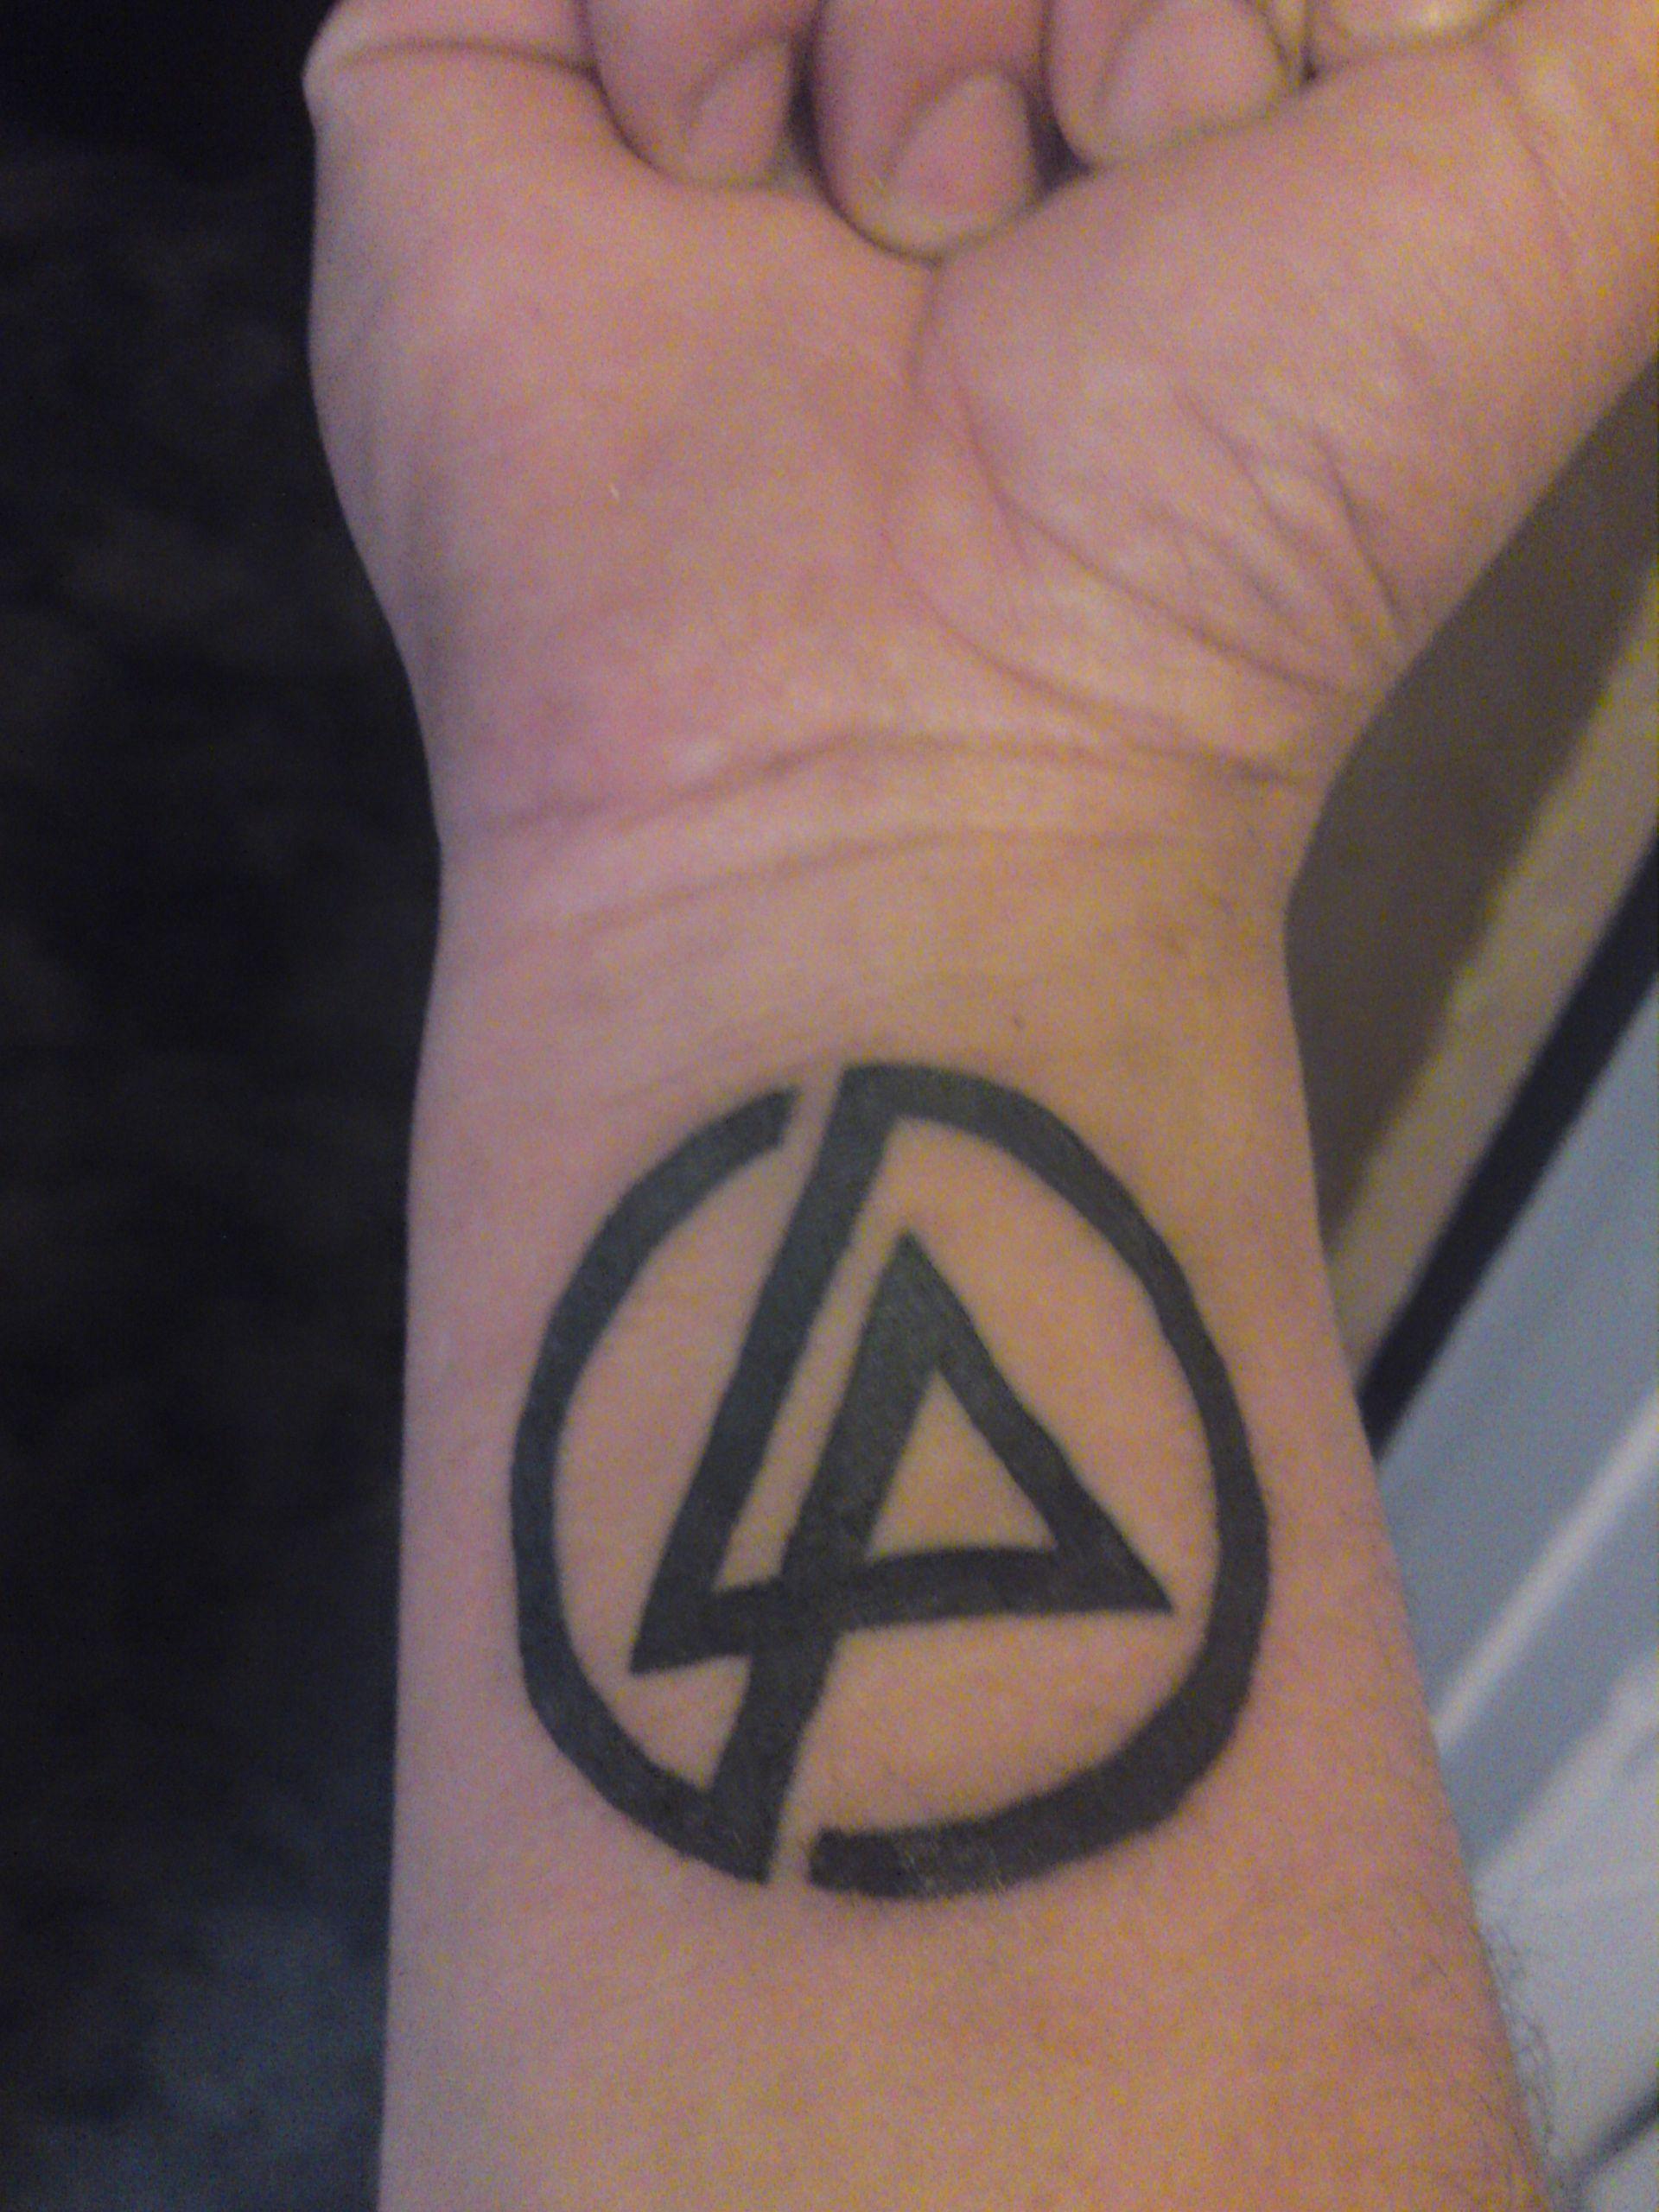 Linkin park tattoo tattoos pinterest linkin park tattoo linkin park tattoo biocorpaavc